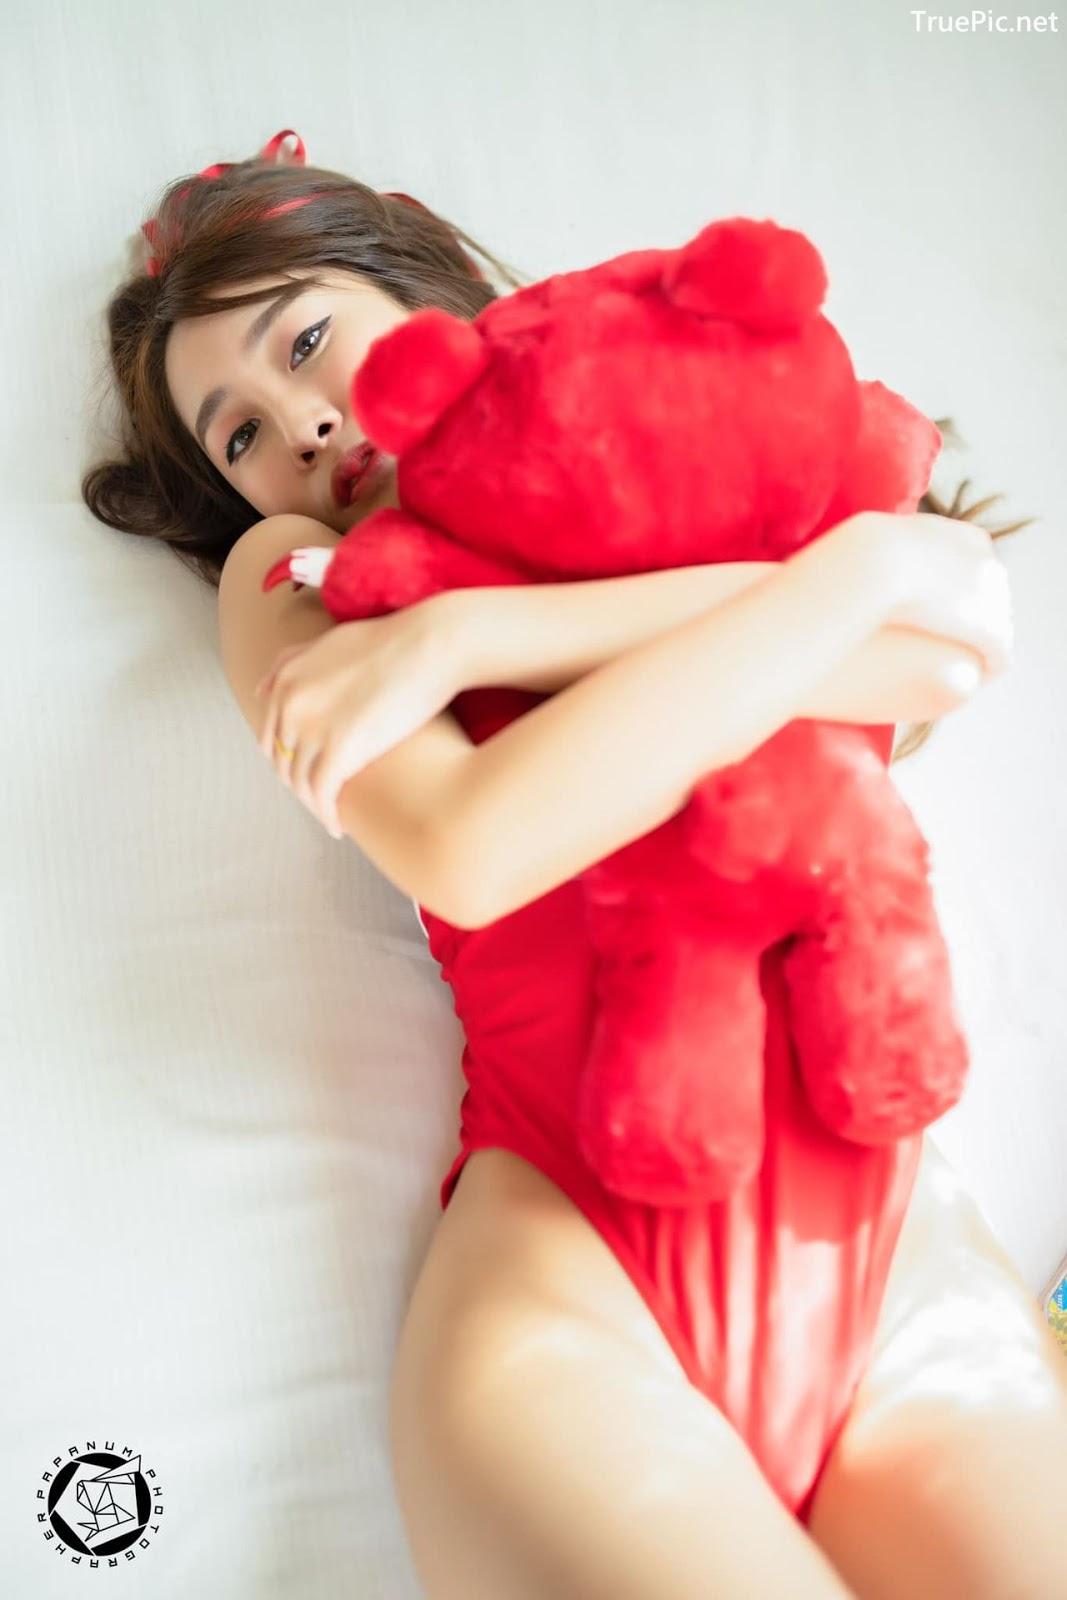 Image-Thailand-Sexy-Model-Suneta-Ngachalvy-Concept-Gloomy-Bear-TruePic.net- Picture-6